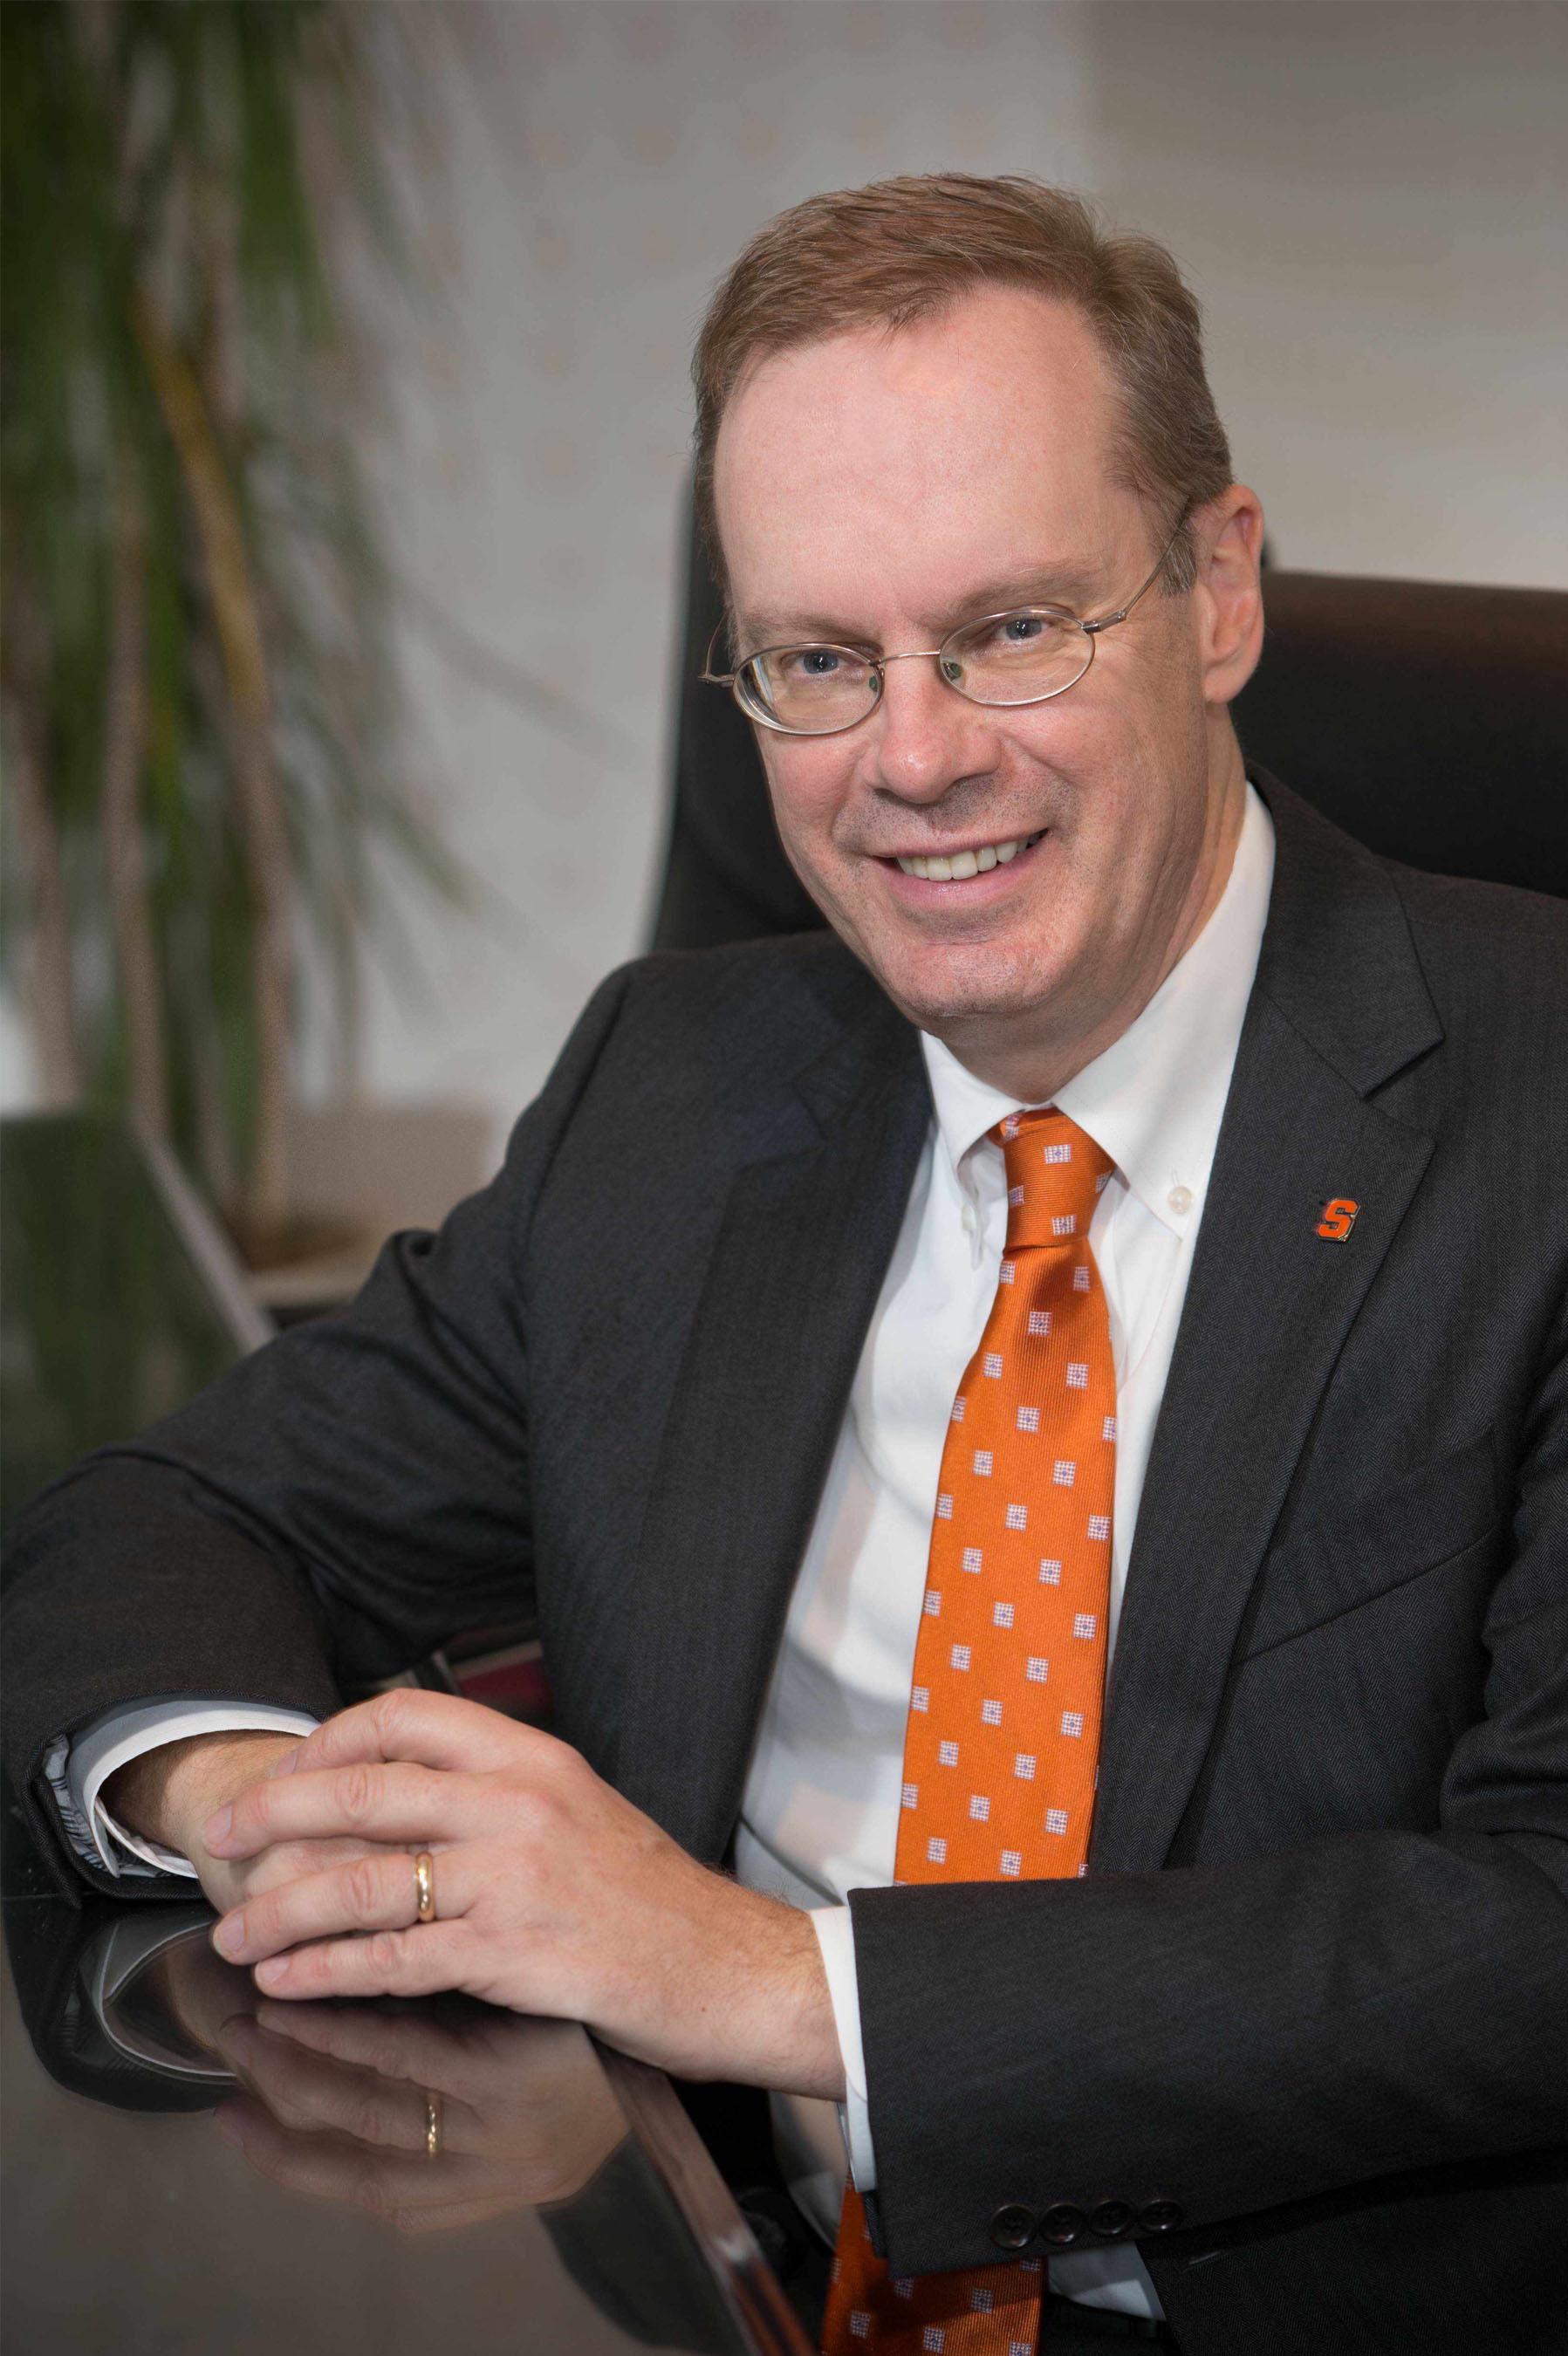 Syracuse University Chancellor-designate Kent D. Syverud. (PRNewsFoto/Syracuse University) (PRNewsFoto/SYRACUSE UNIVERSITY)